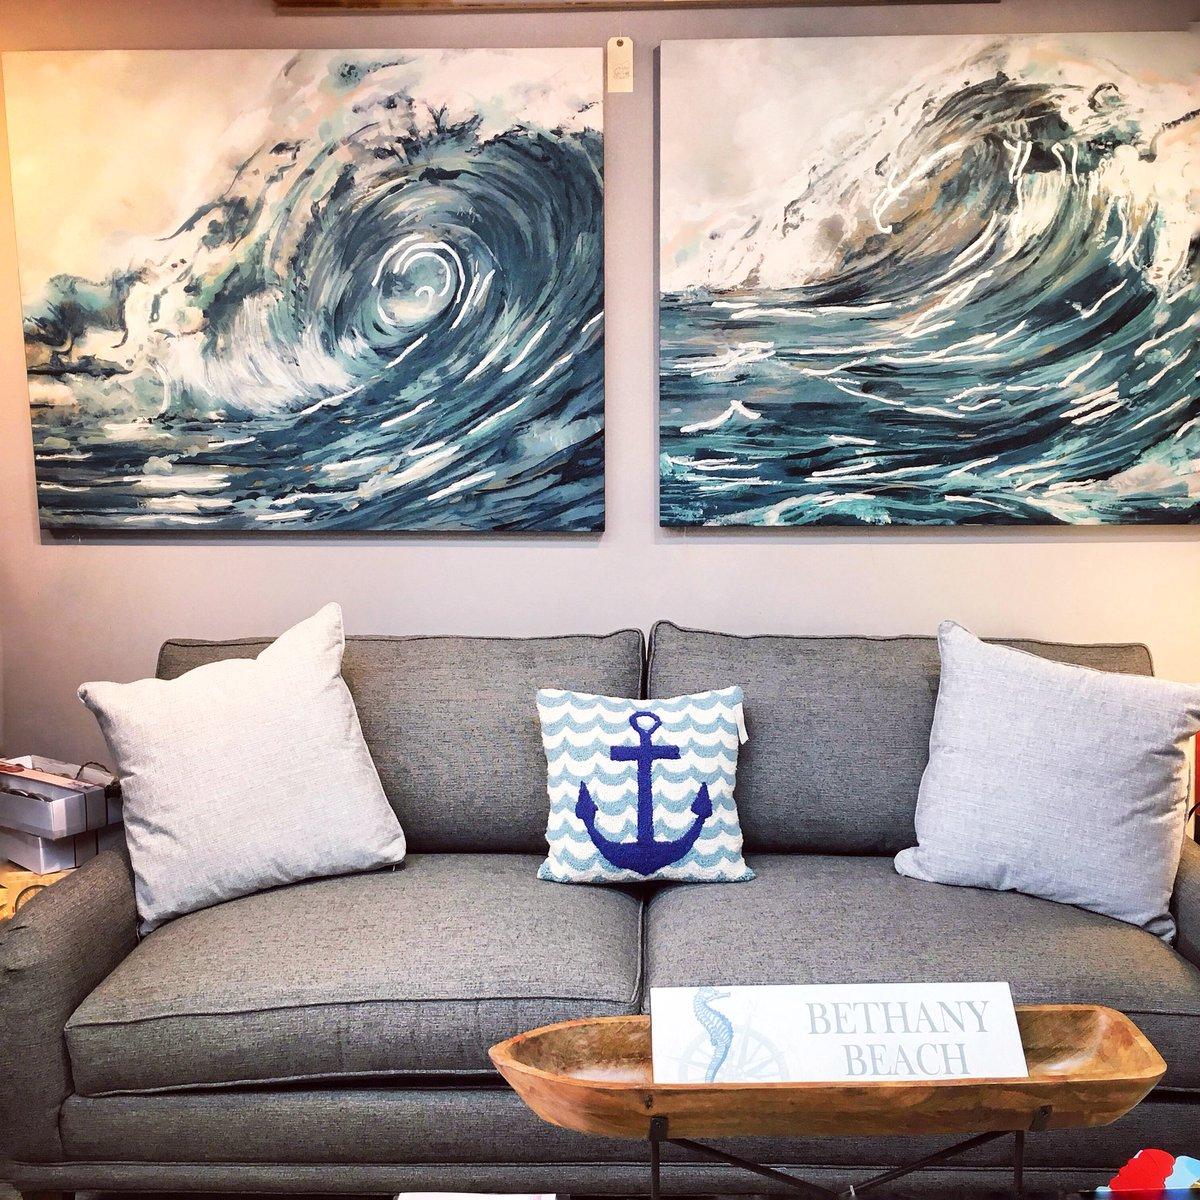 Su Casa Furniture And BethanyBeach DE